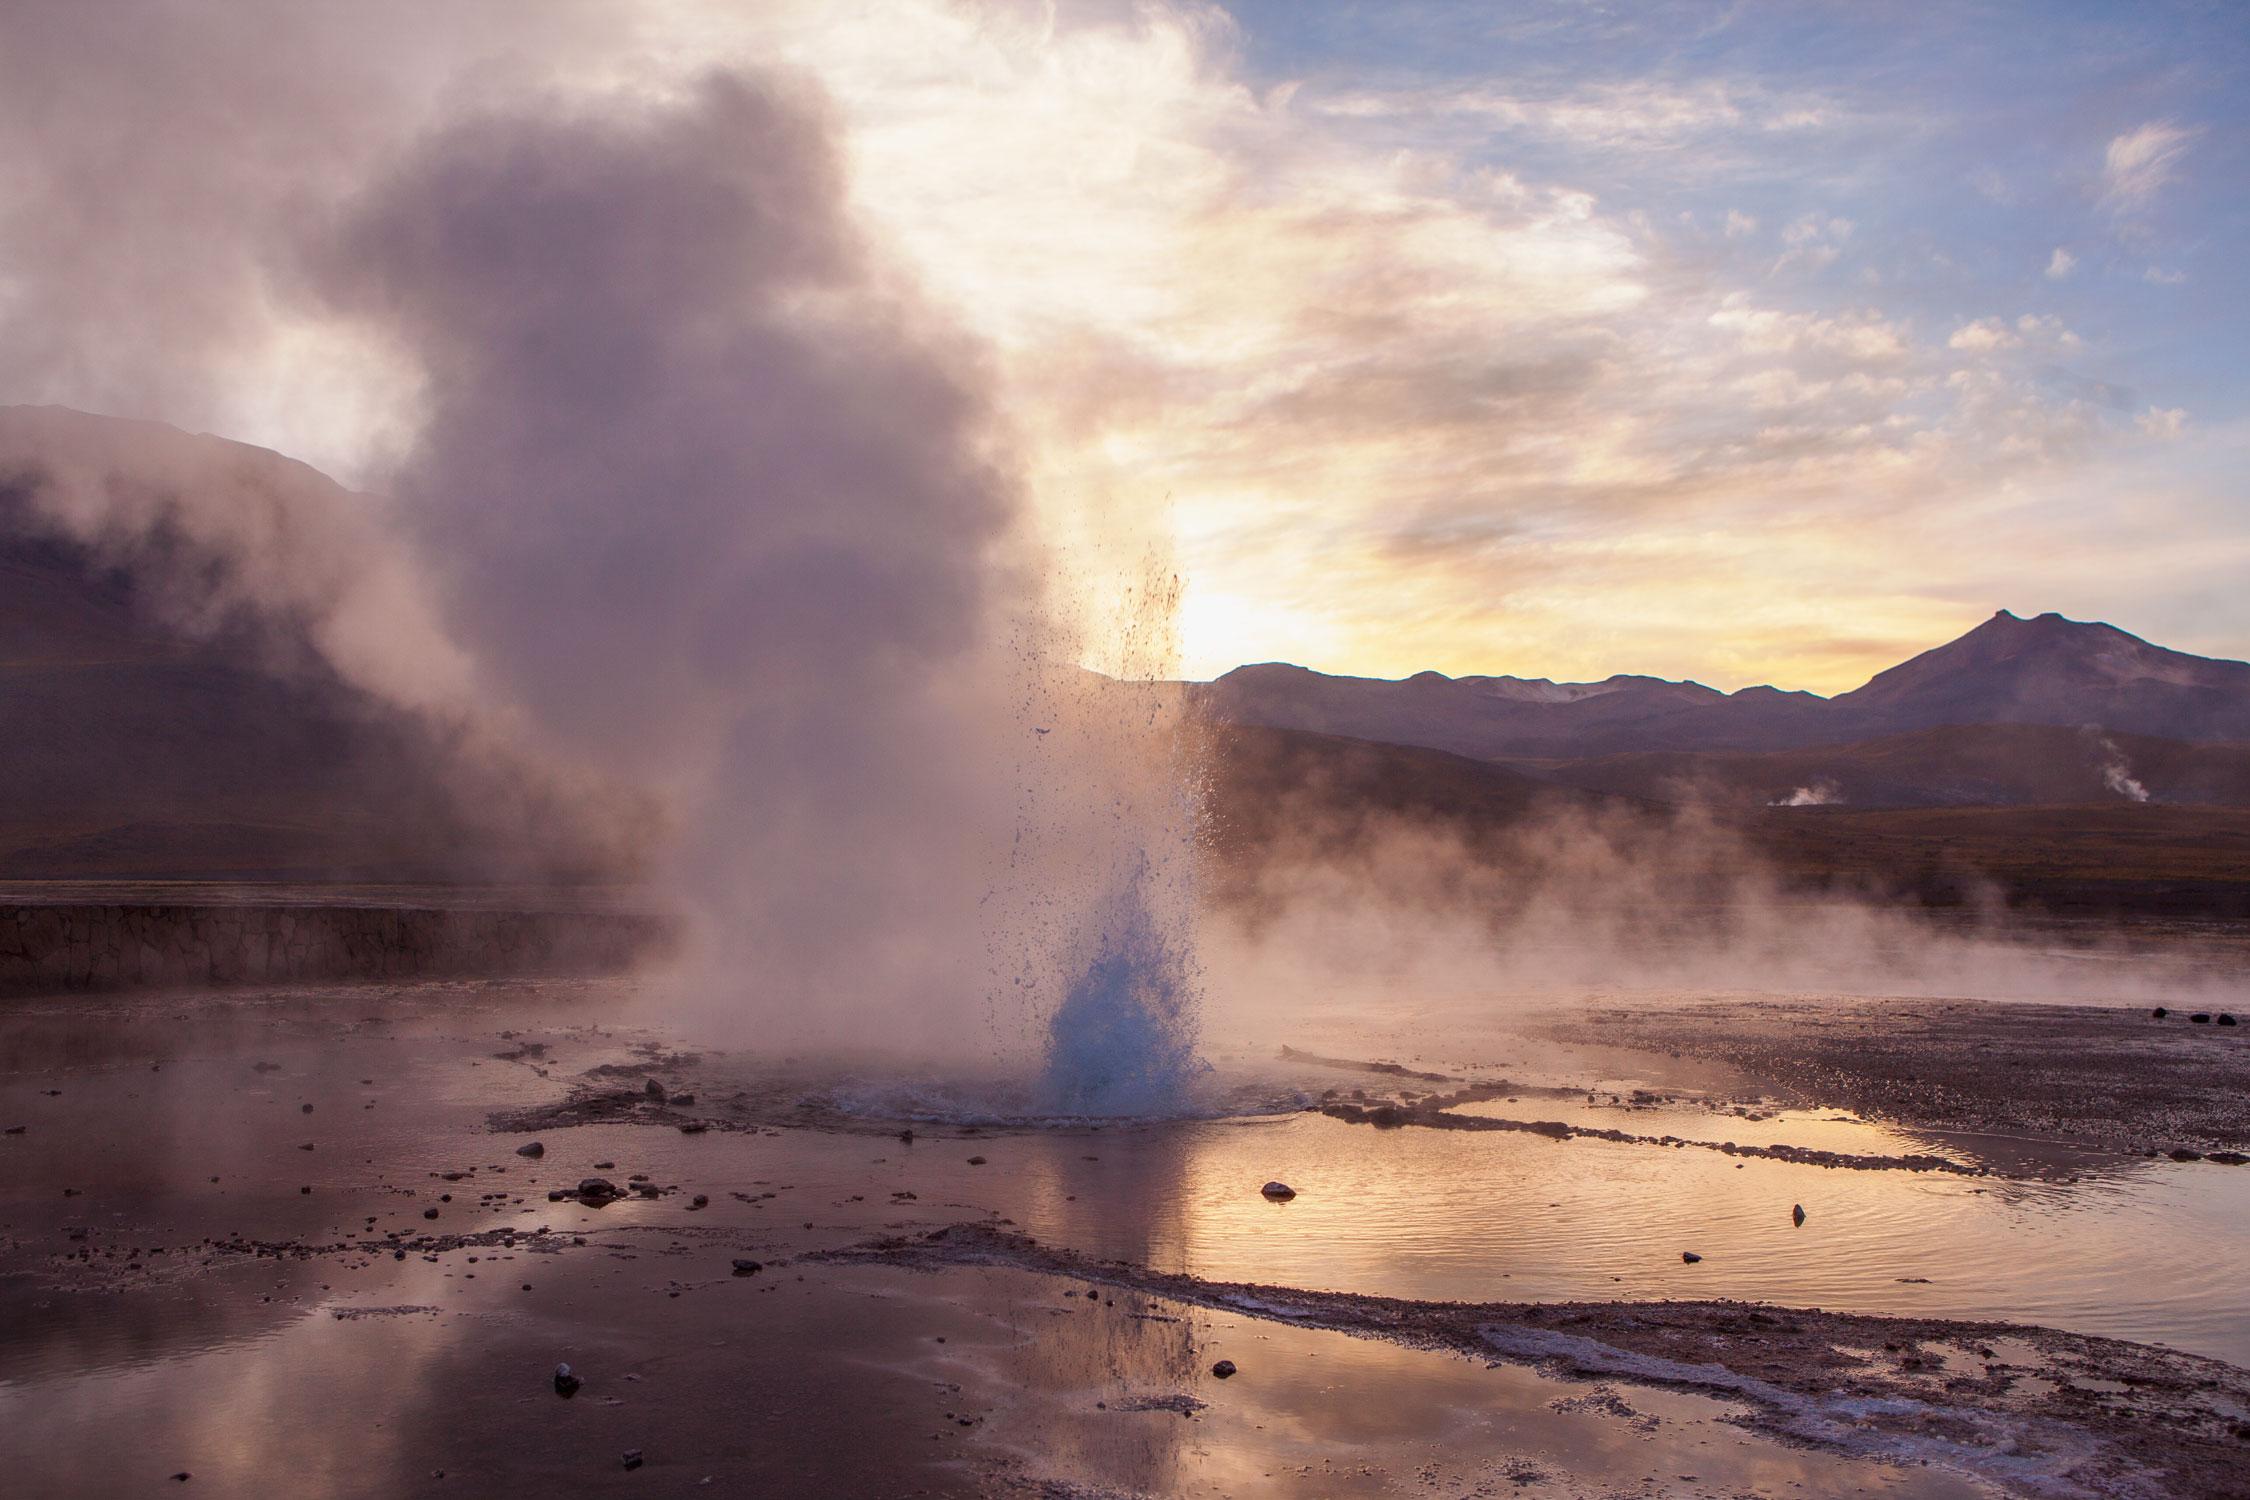 atacama-desert-chile-wander-south-el-tatio-geysers-4.jpg